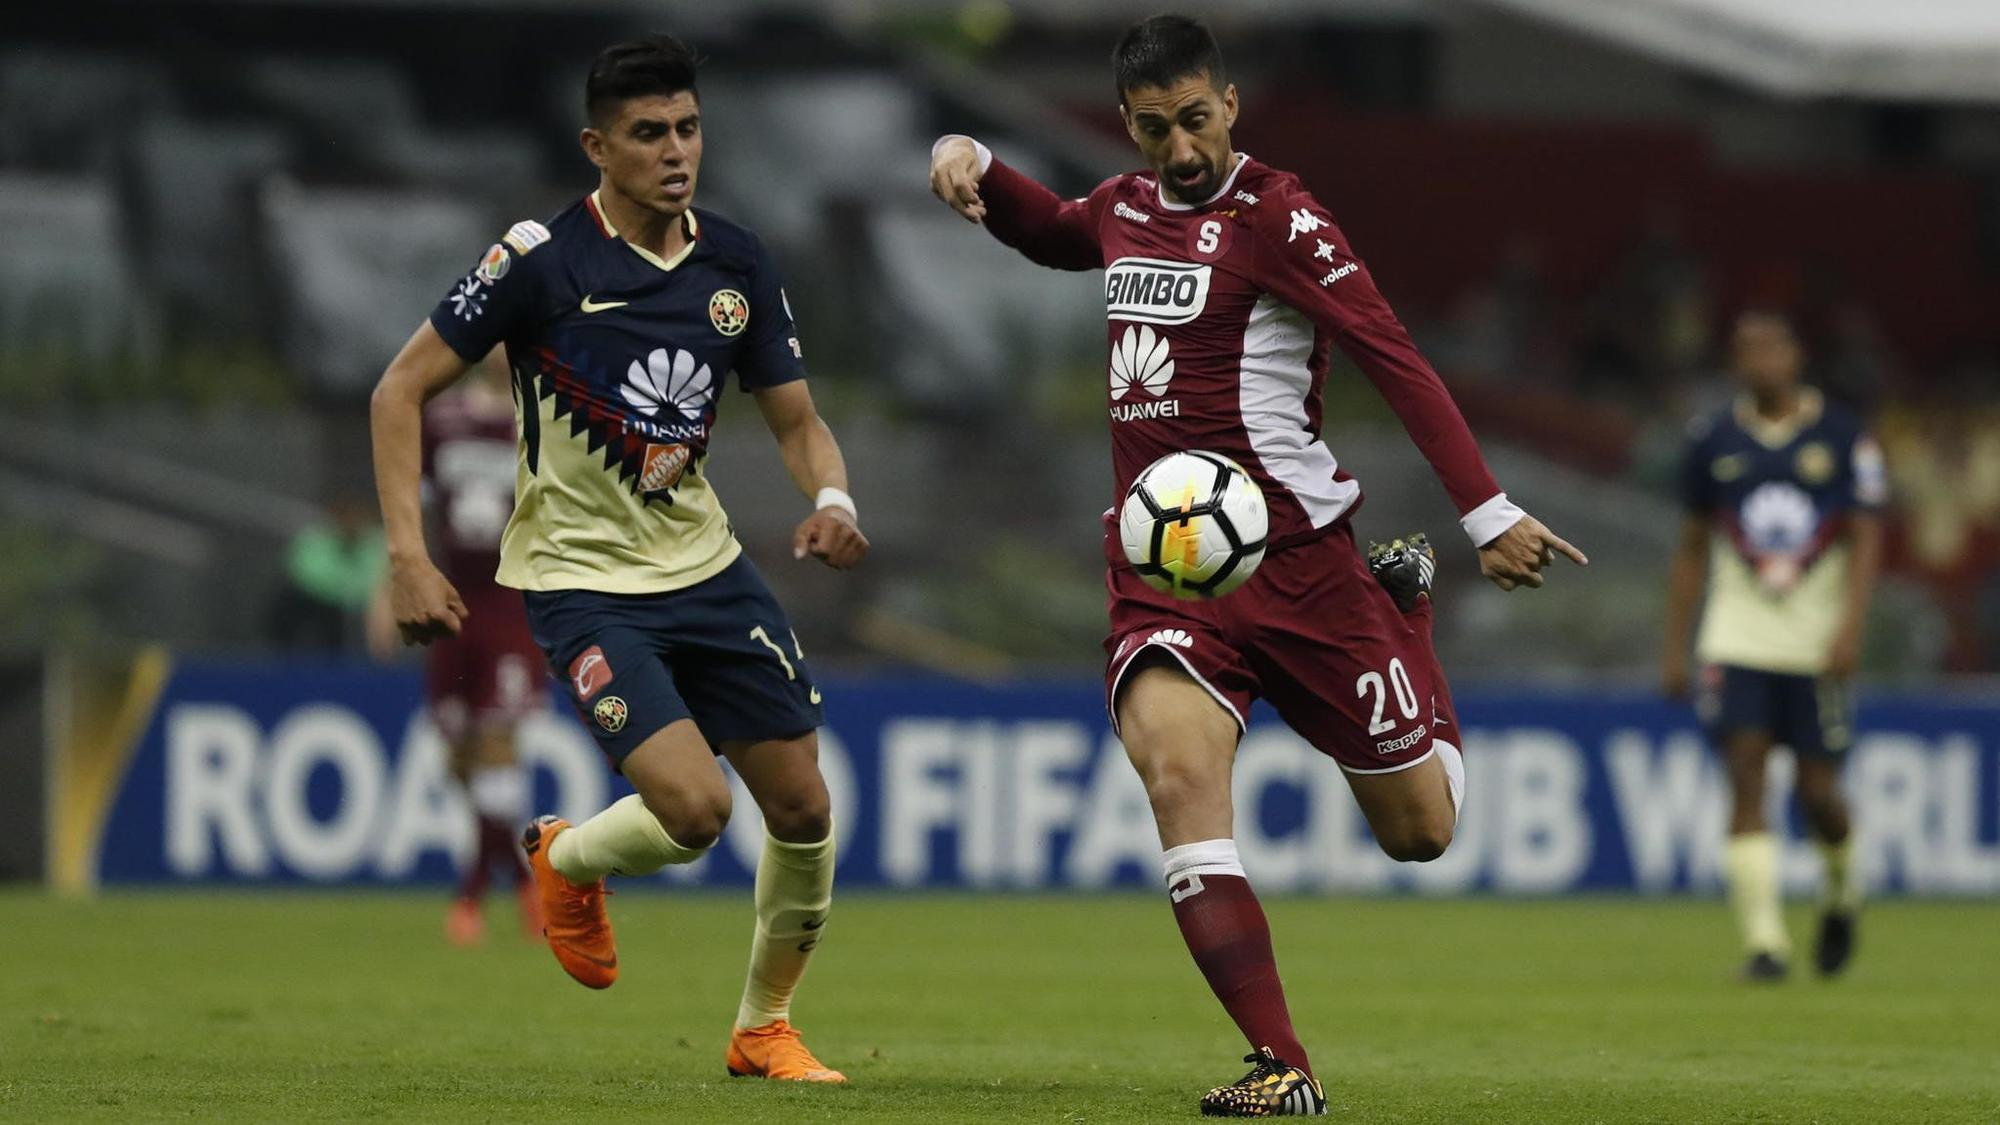 Sd-sp-soccer-america-xolos-sdccu-joe-corona-20180324